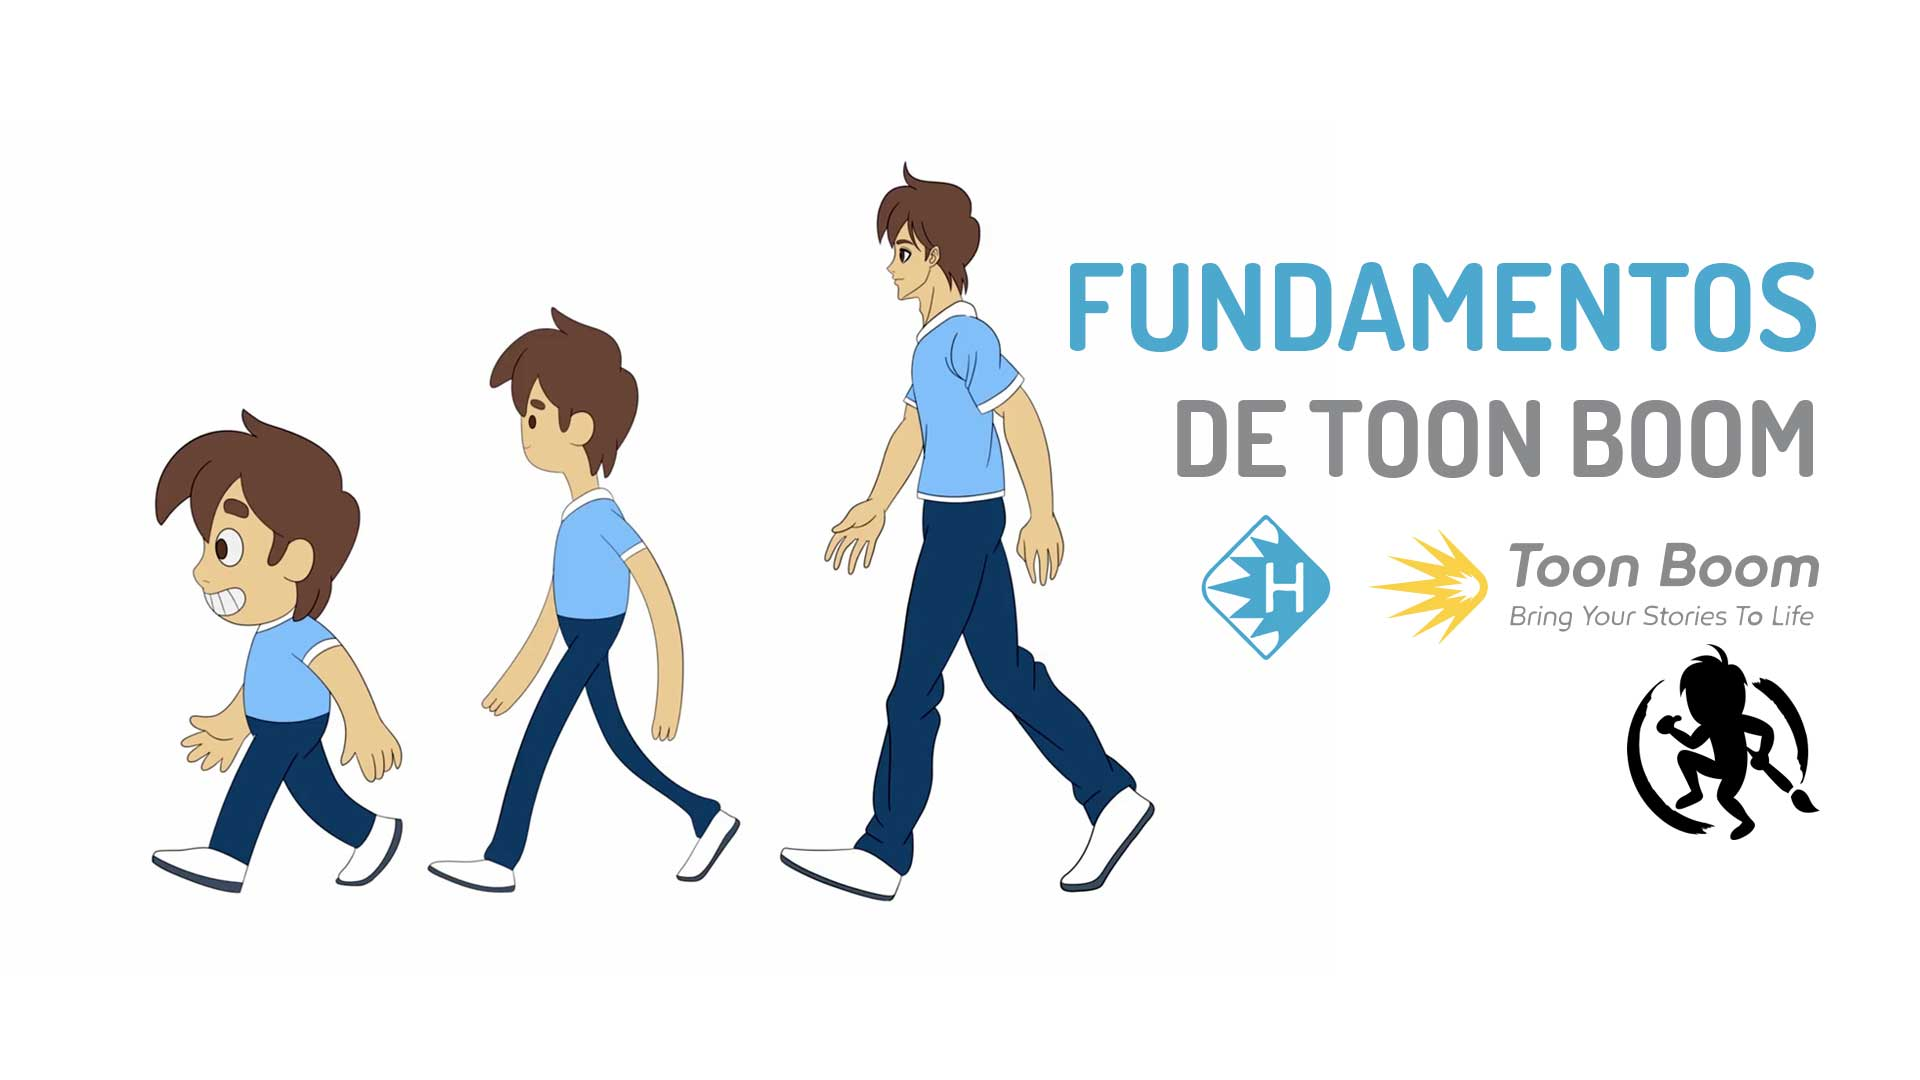 Fundamentos de Toon Boom